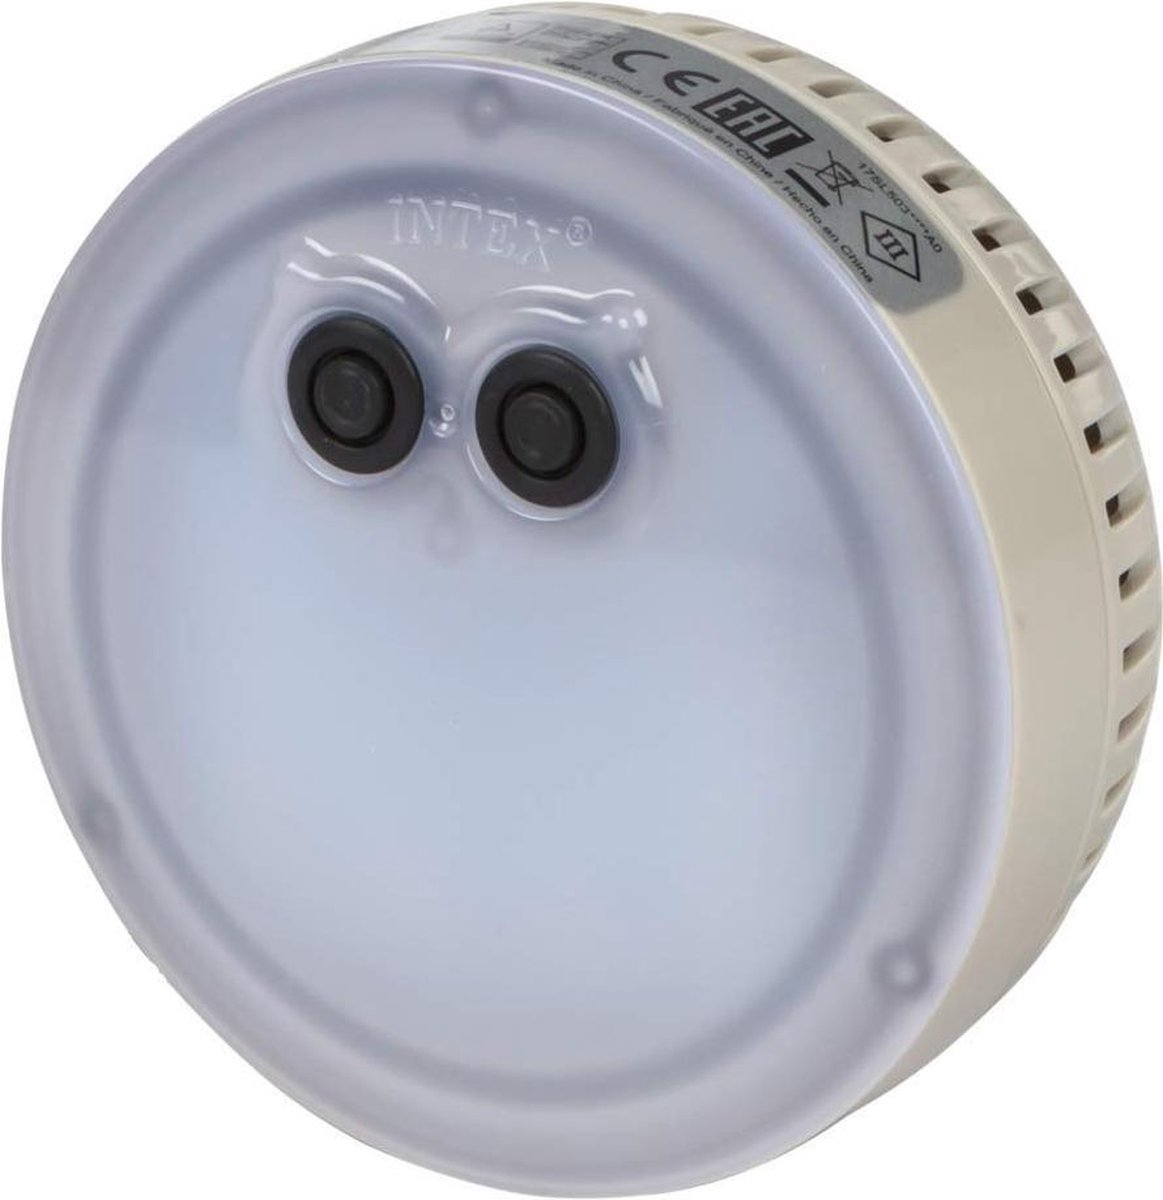 Intex Led-verlichting Multicolor Voor Spa 16,5 Cm Wit